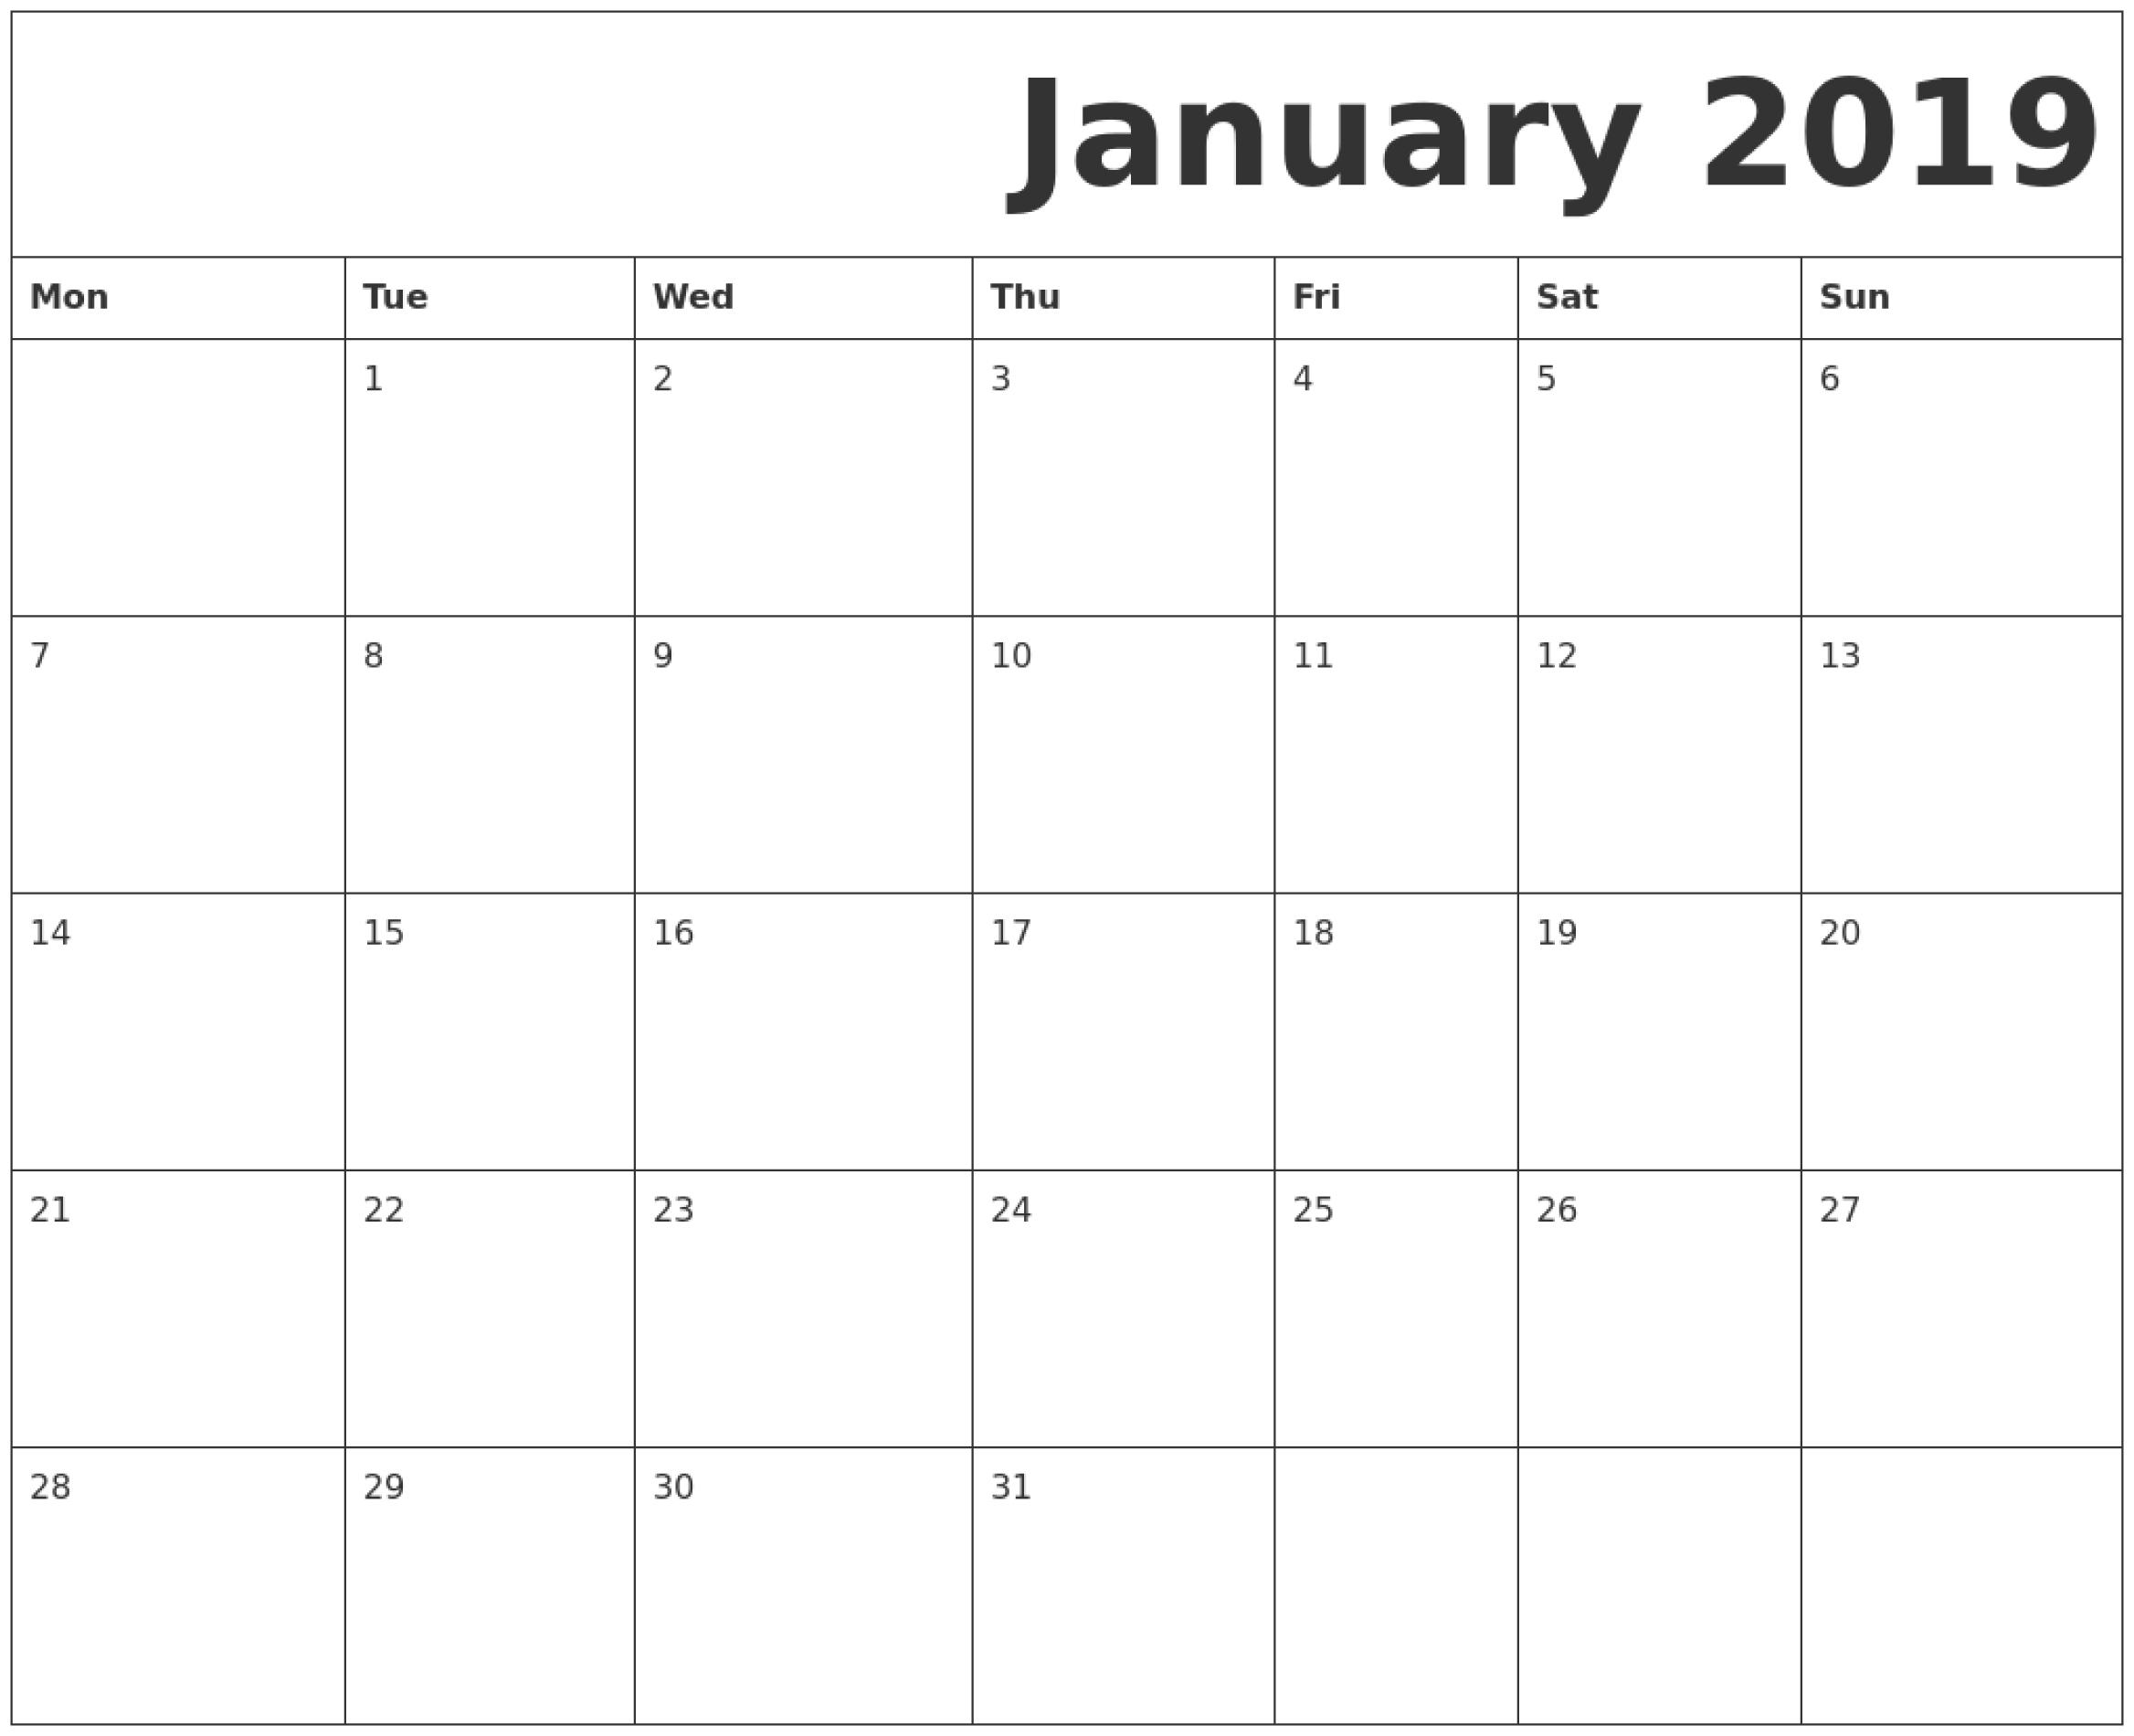 January 2019 Printable Calendar Monday Start. | January 2019-Blank Calendar Starting With Monday